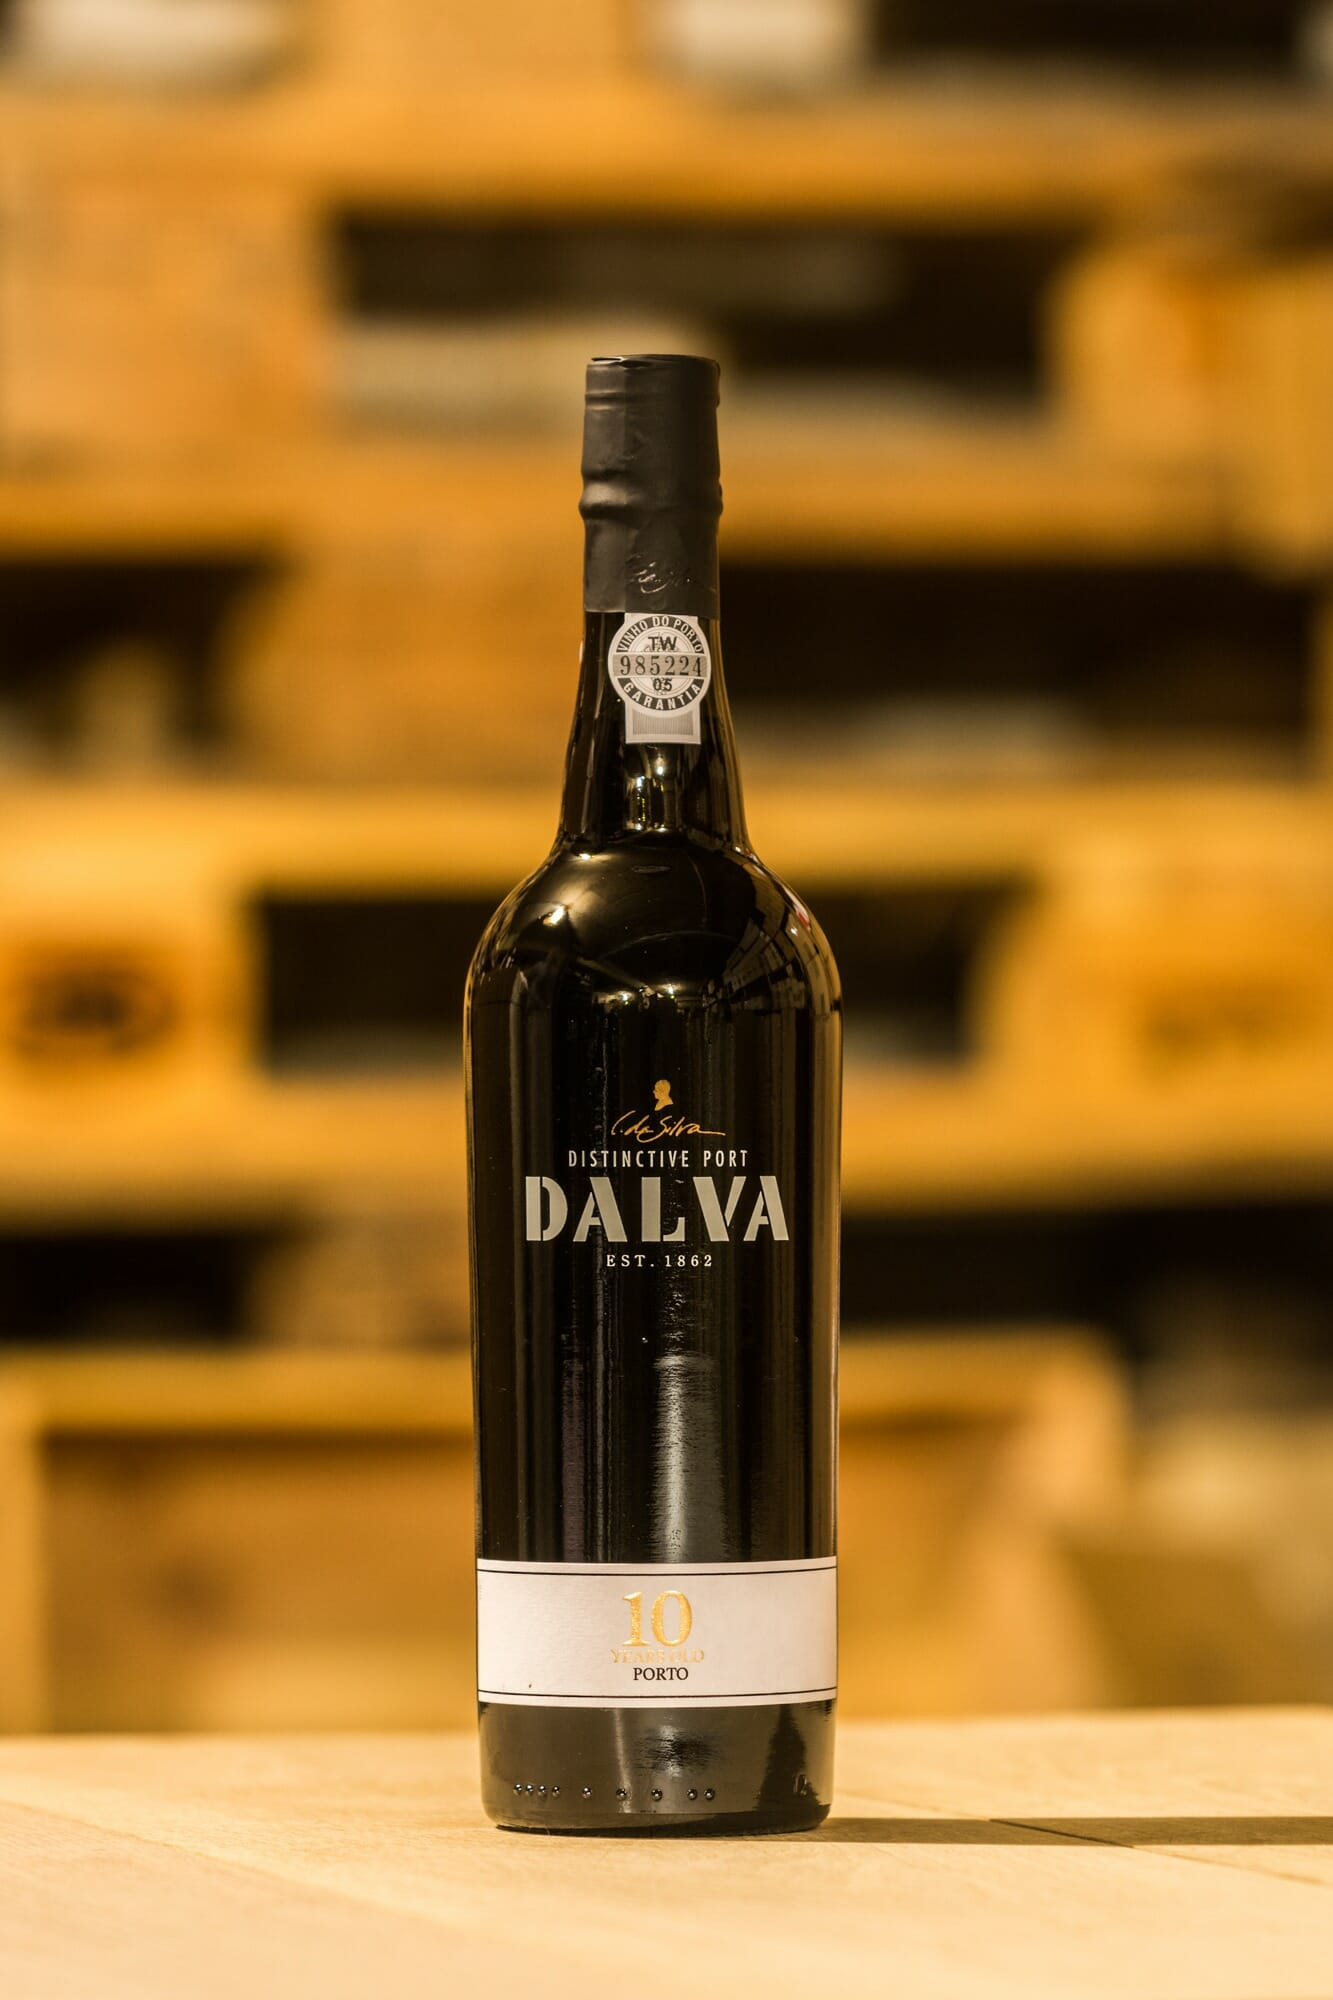 C. da Silva Dalva 10 Years Old Tawny Port